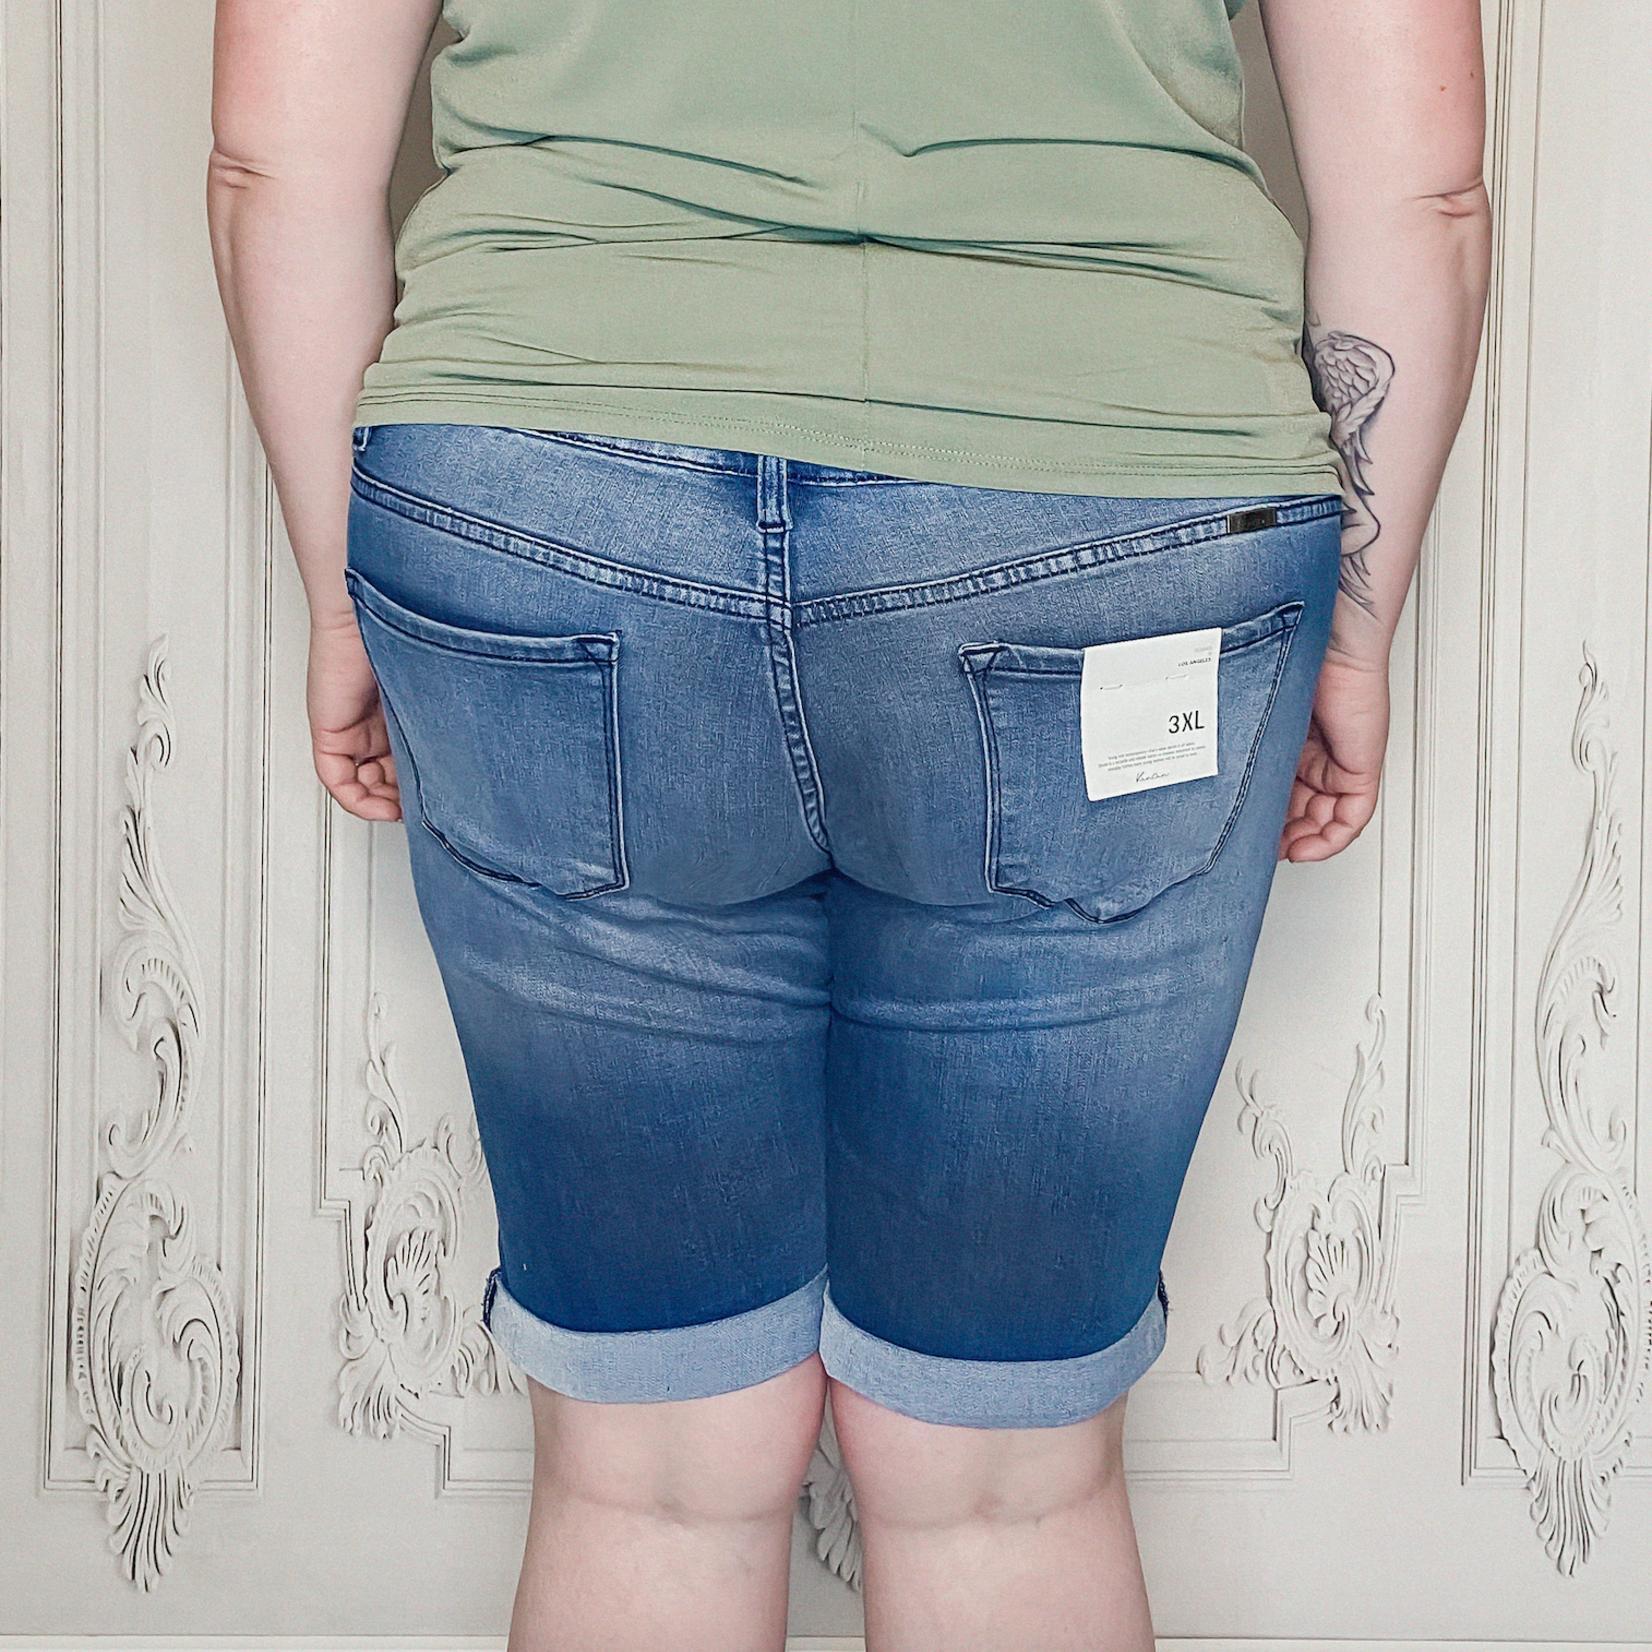 Kathy curvy bermuda shorts